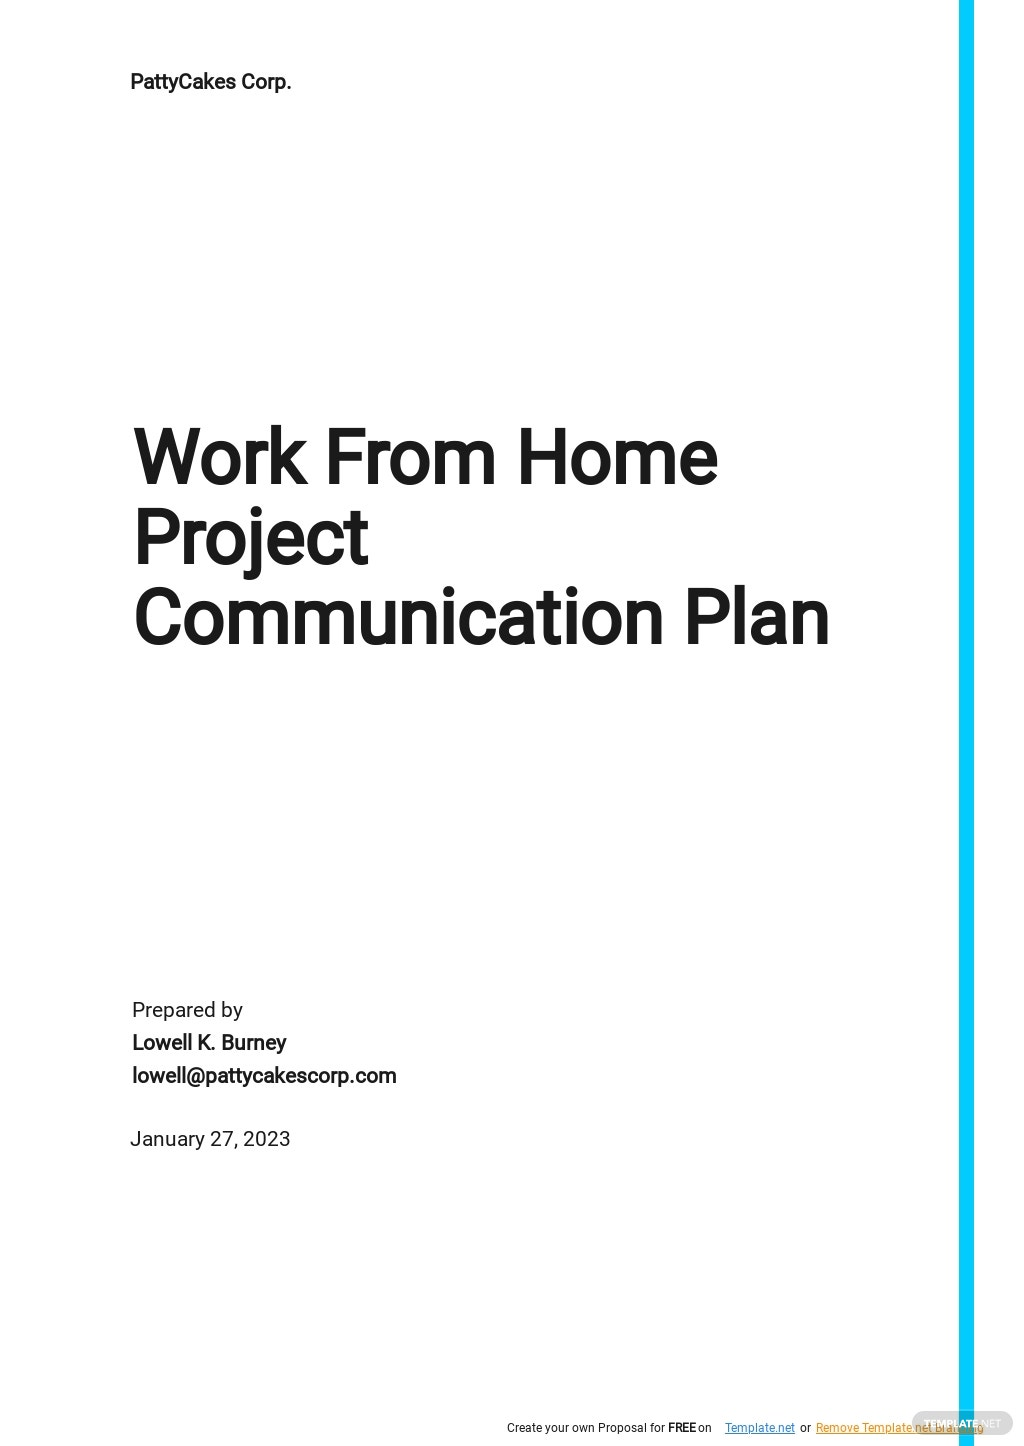 WFH Project Communication Plan Template.jpe